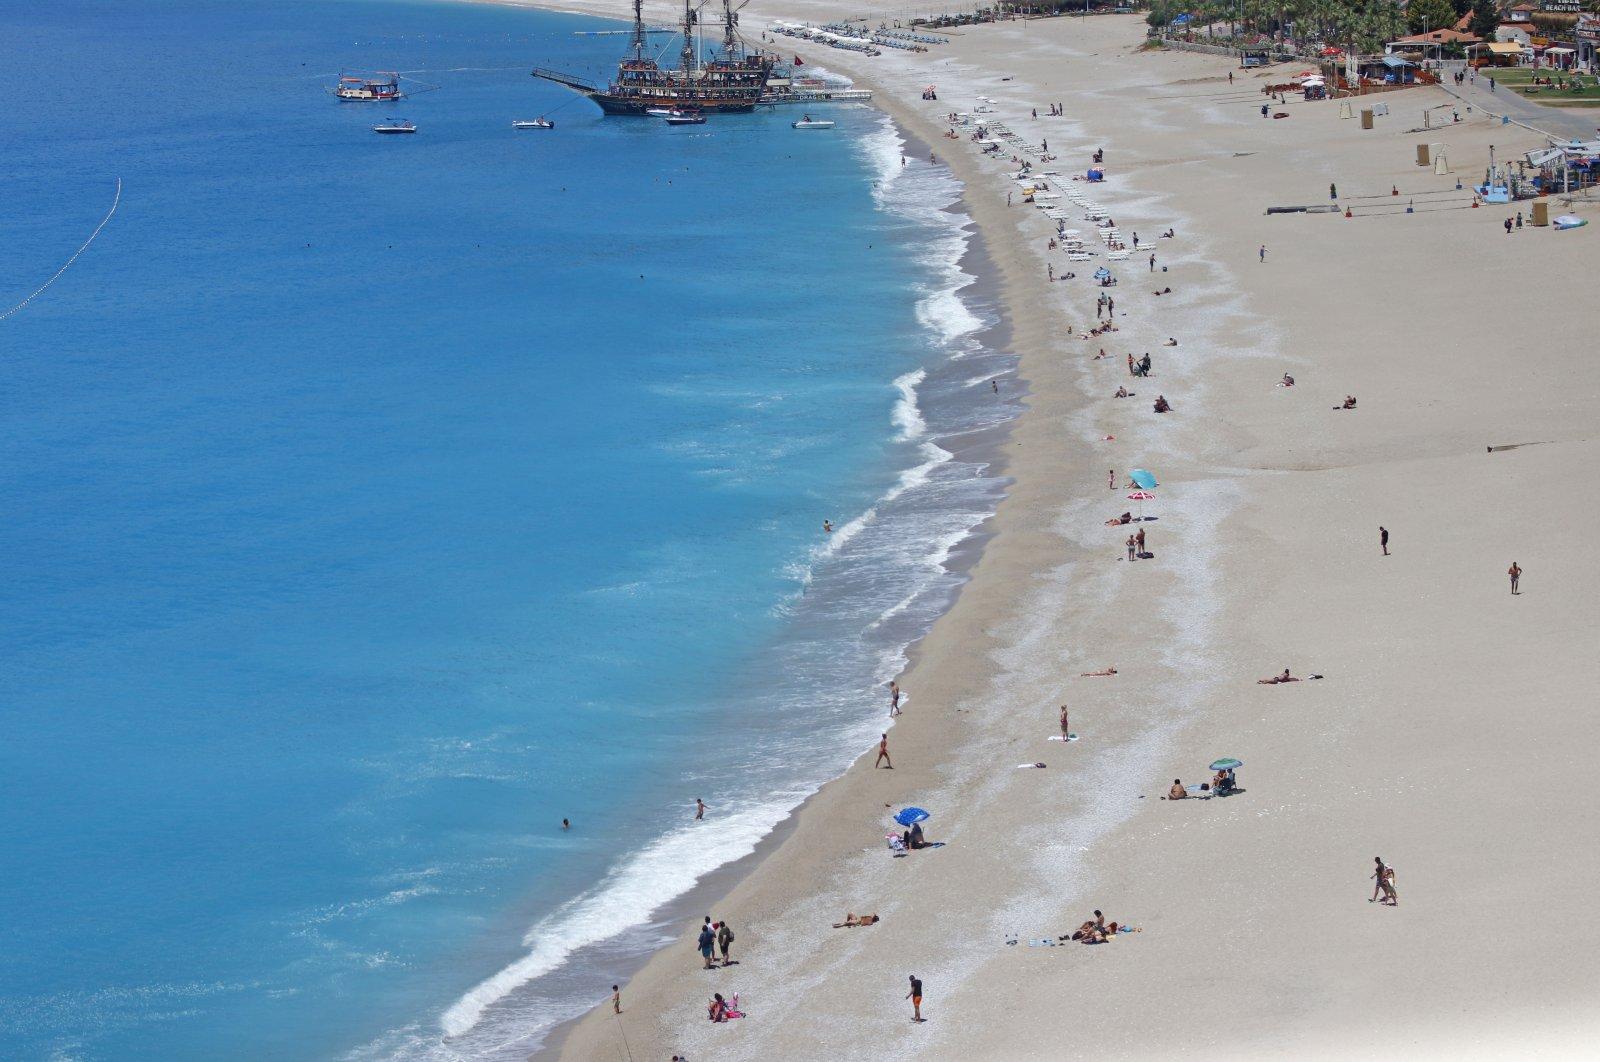 People are seen on a beachin Fethiye, Muğla province, southwestern Turkey, May 17, 2021.